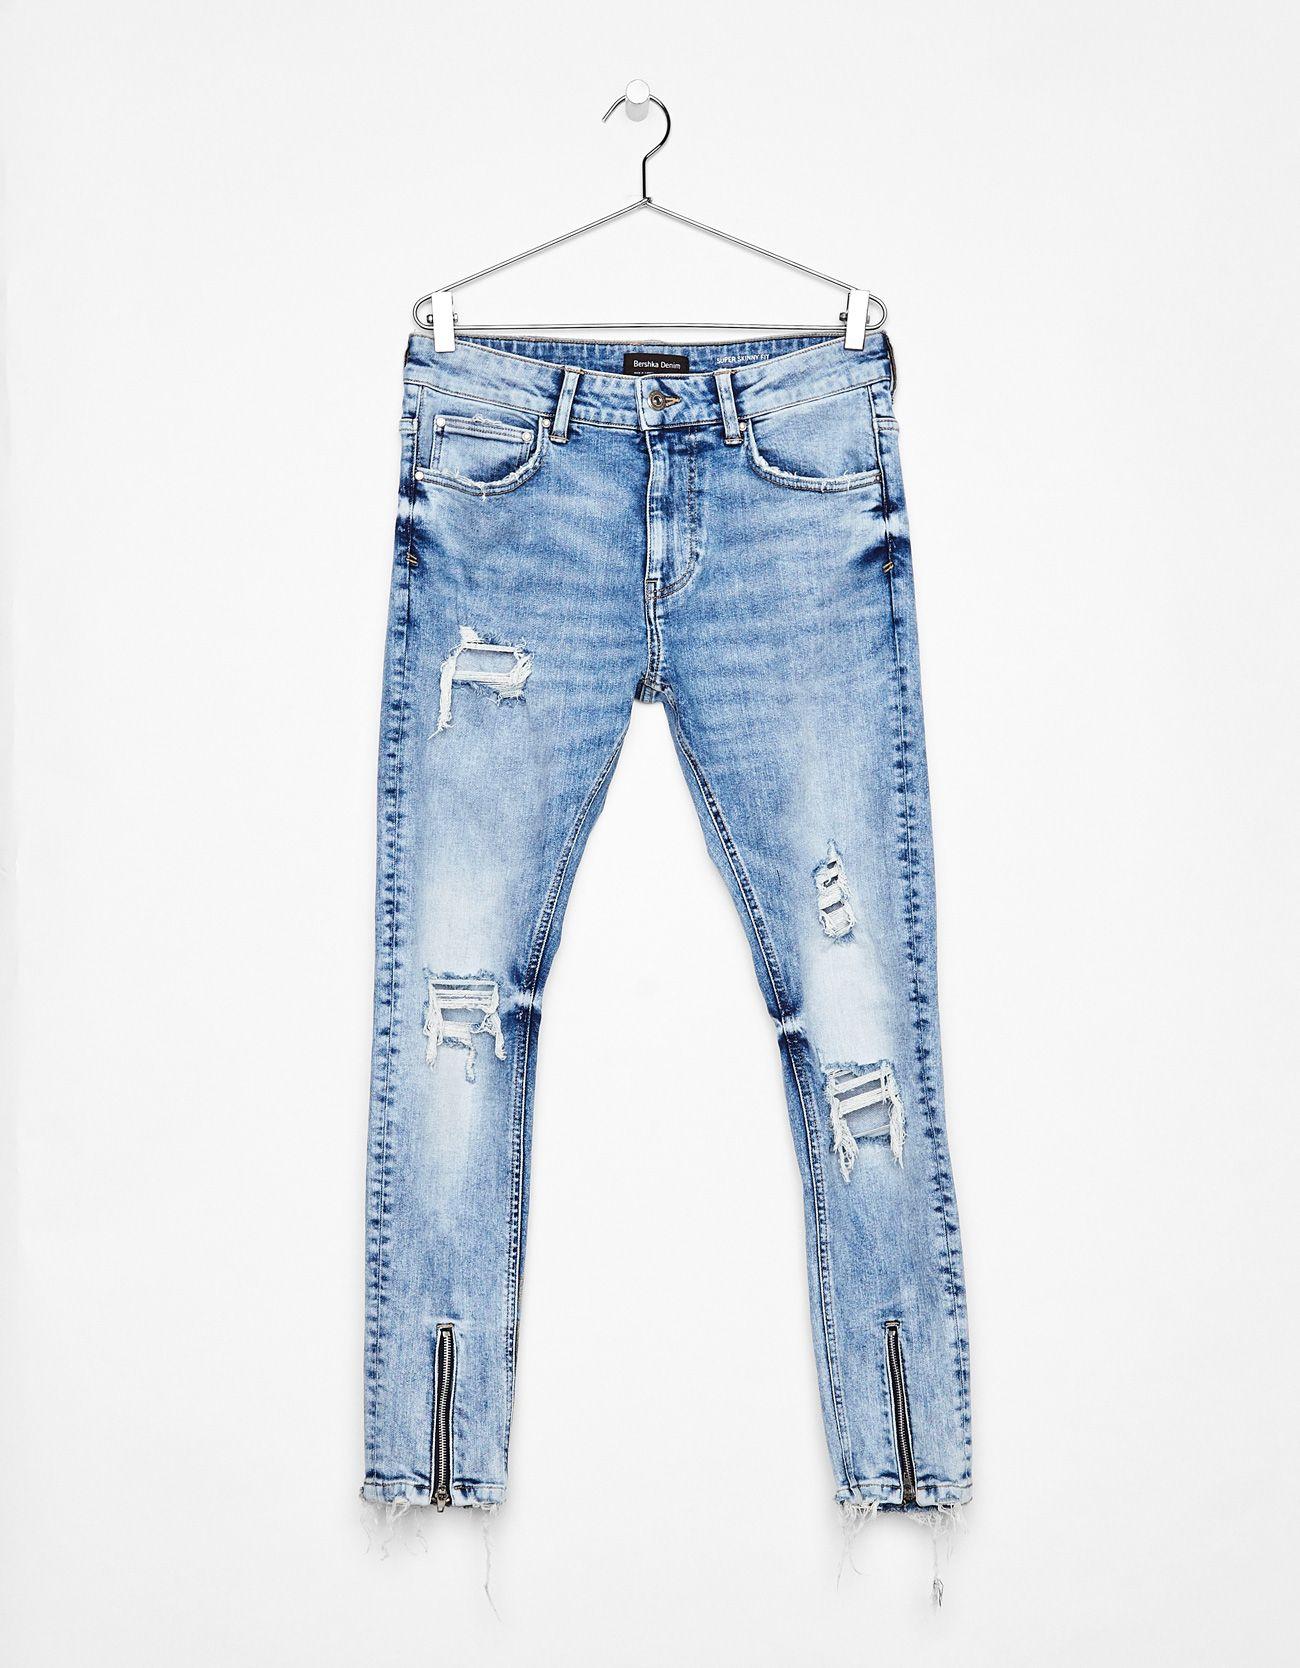 Jeans Super Skinny Fit Con Cremalleras Jeans Bershka Espana Jeans De Moda Pantalones De Moda Jeans Hombre